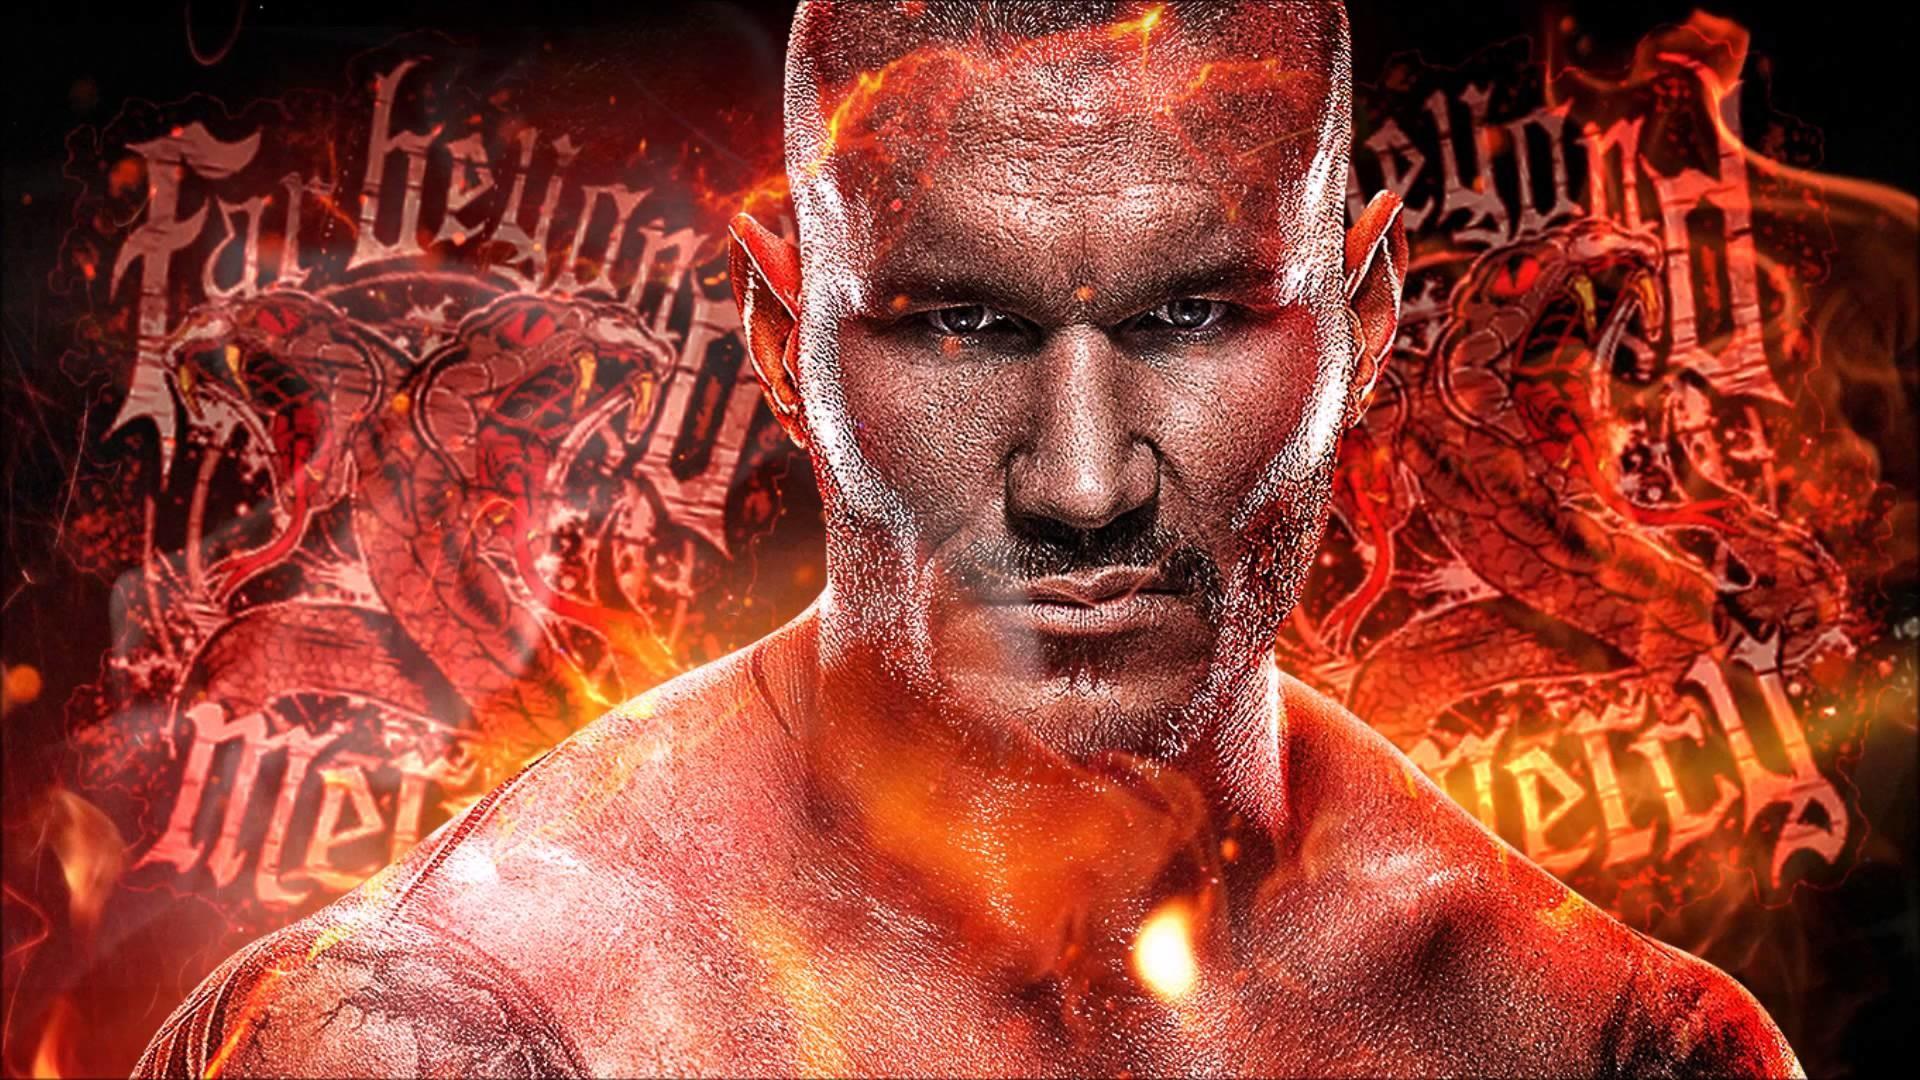 Wallpaper Hd Randy Orton 2018 52 Images